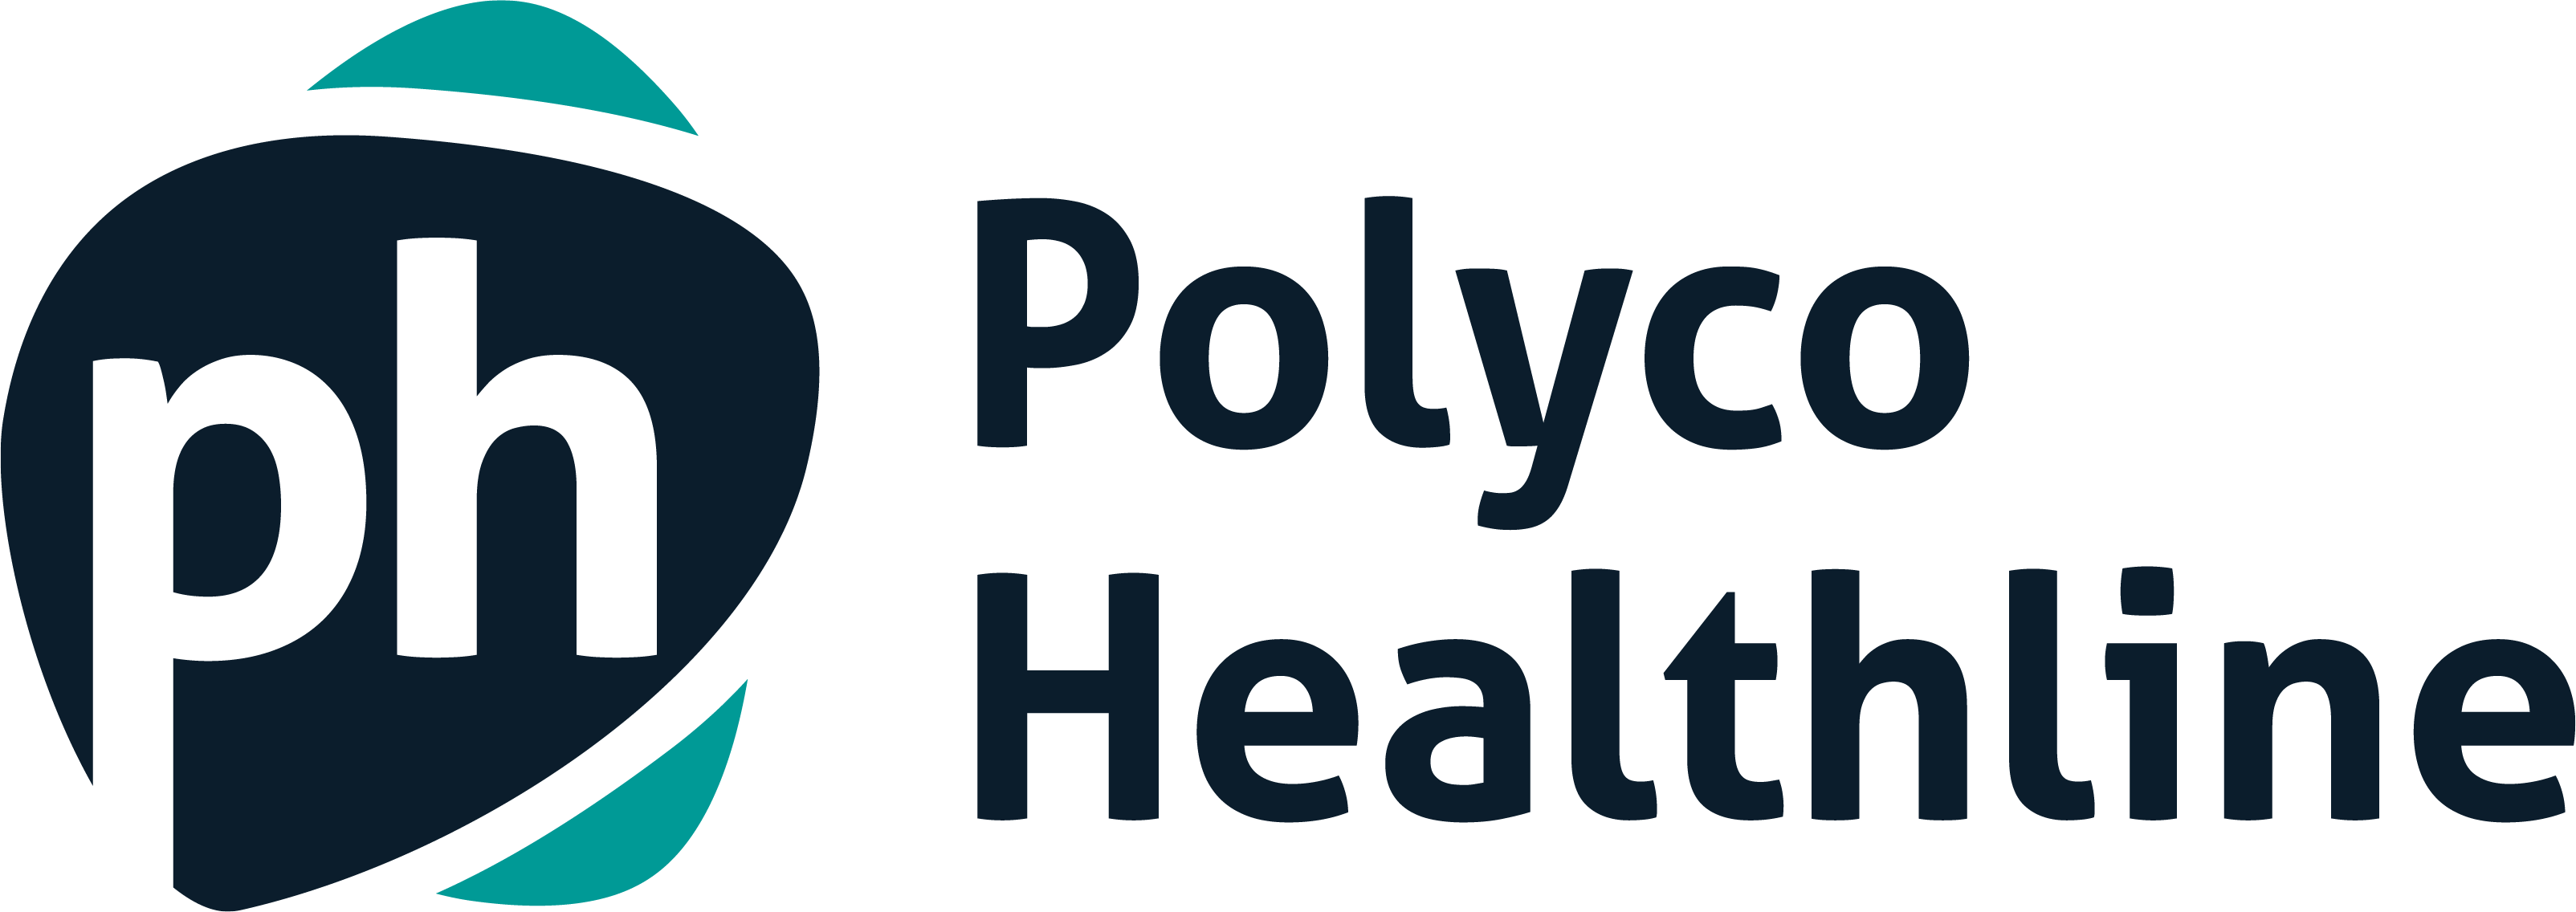 Polycohealthcare